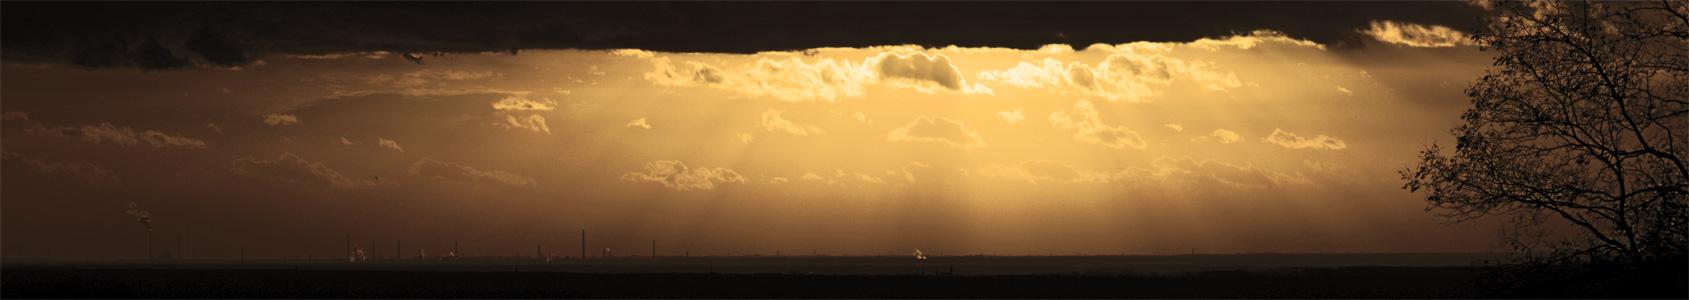 Leuchtender Horizont